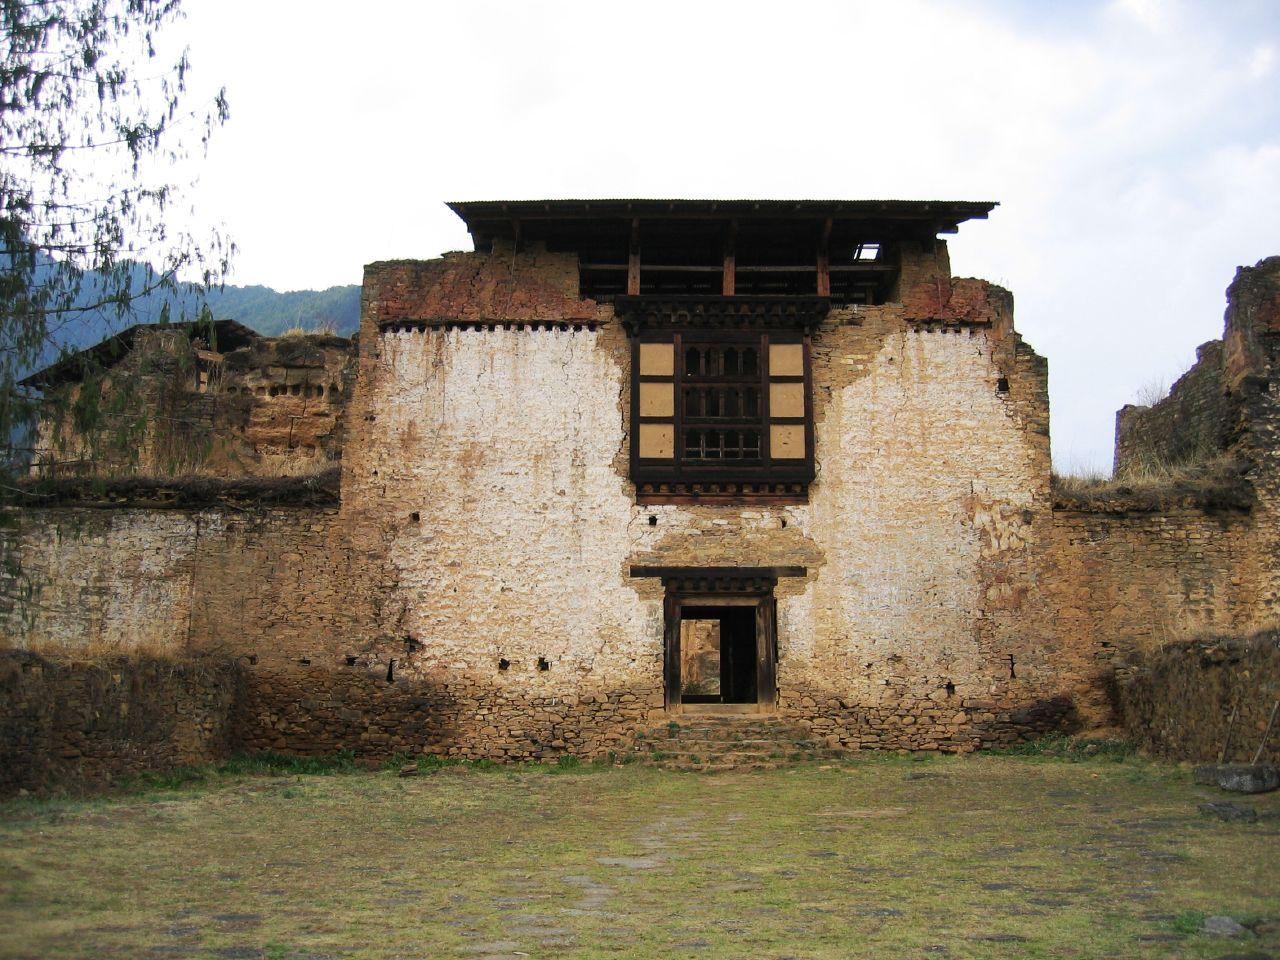 Entryway, Drugyel Dzong